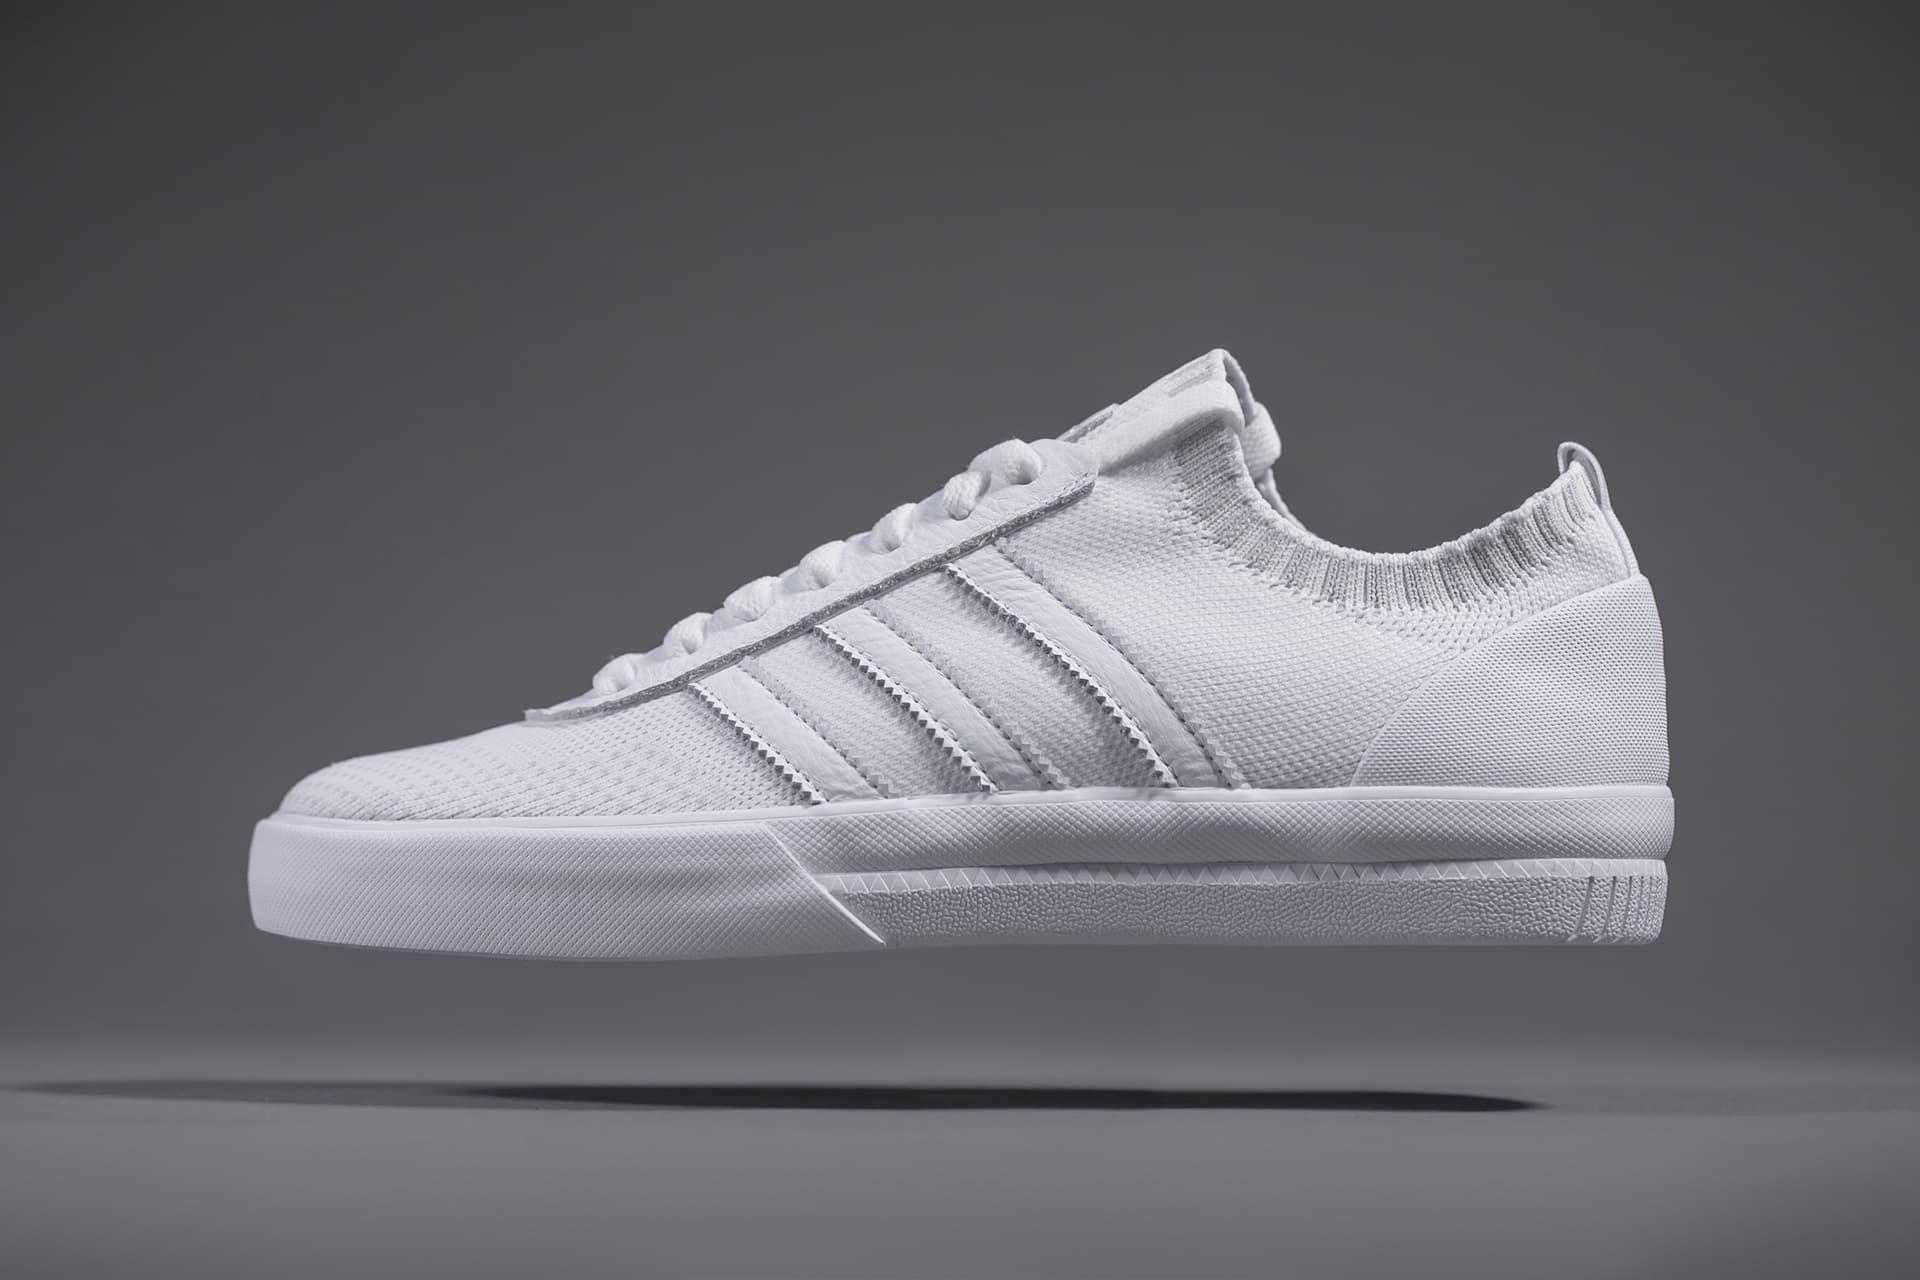 adidas Skateboarding Reveals a Striking White Premiere Primeknit for Lucas Puig Collaboration